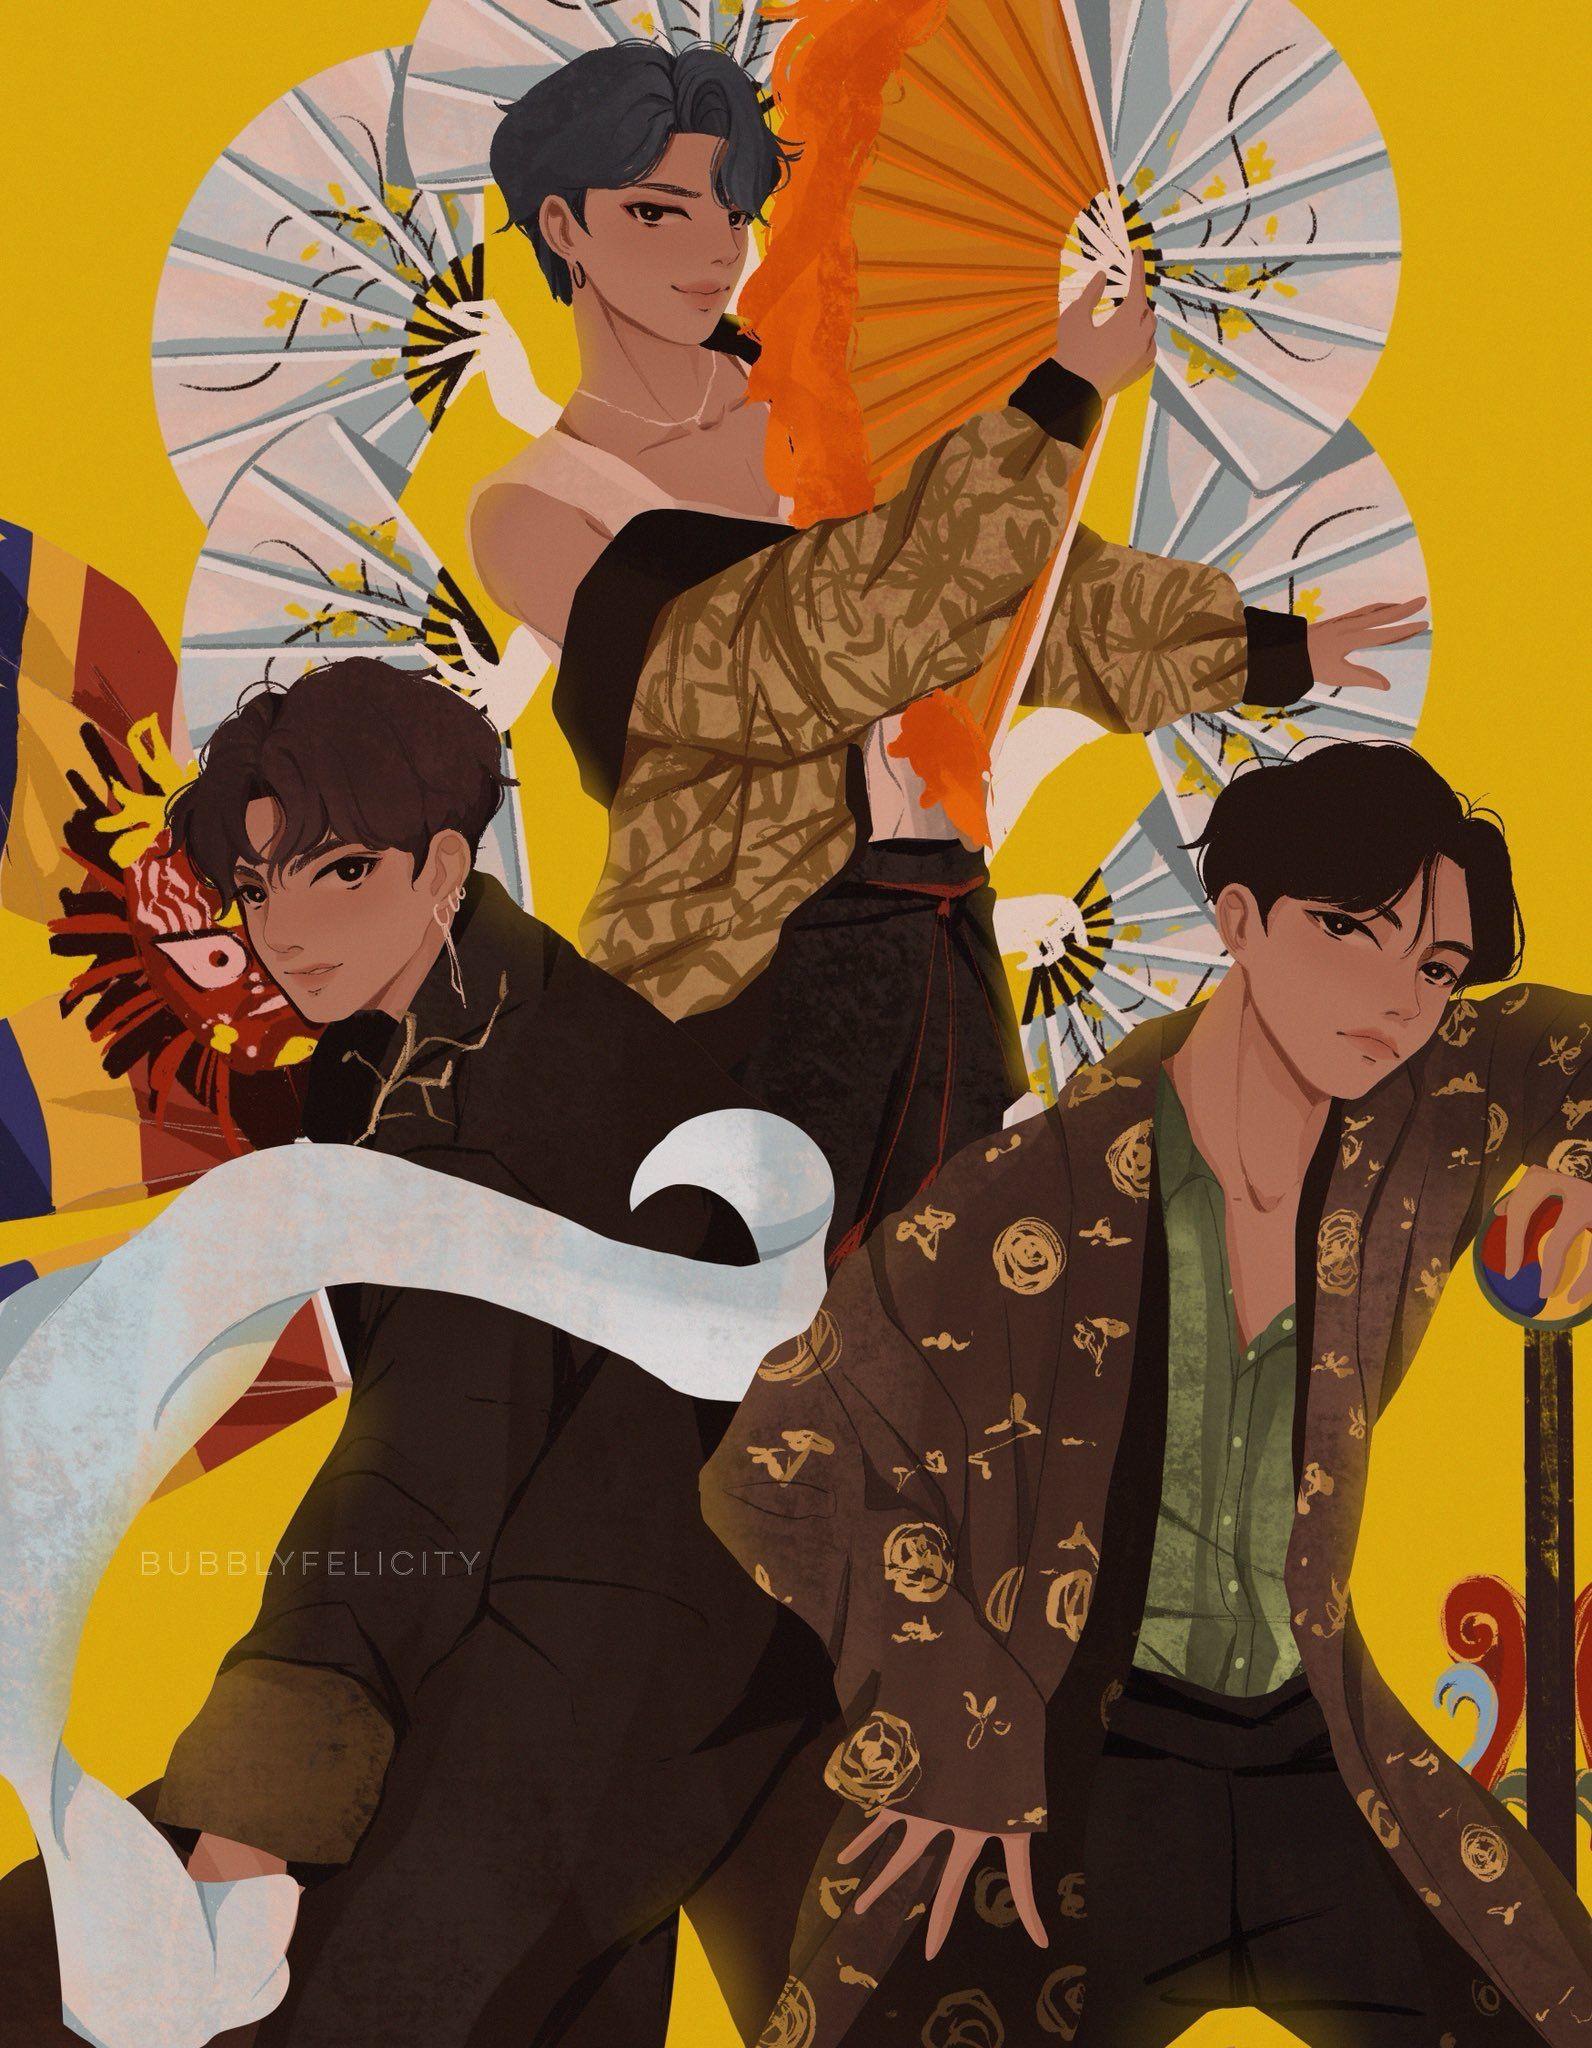 3j Bts Idol Mma Melon Music Awards 2018 Jimin Jungkook J Hope Fan Art Bts Drawings Bts Fanart